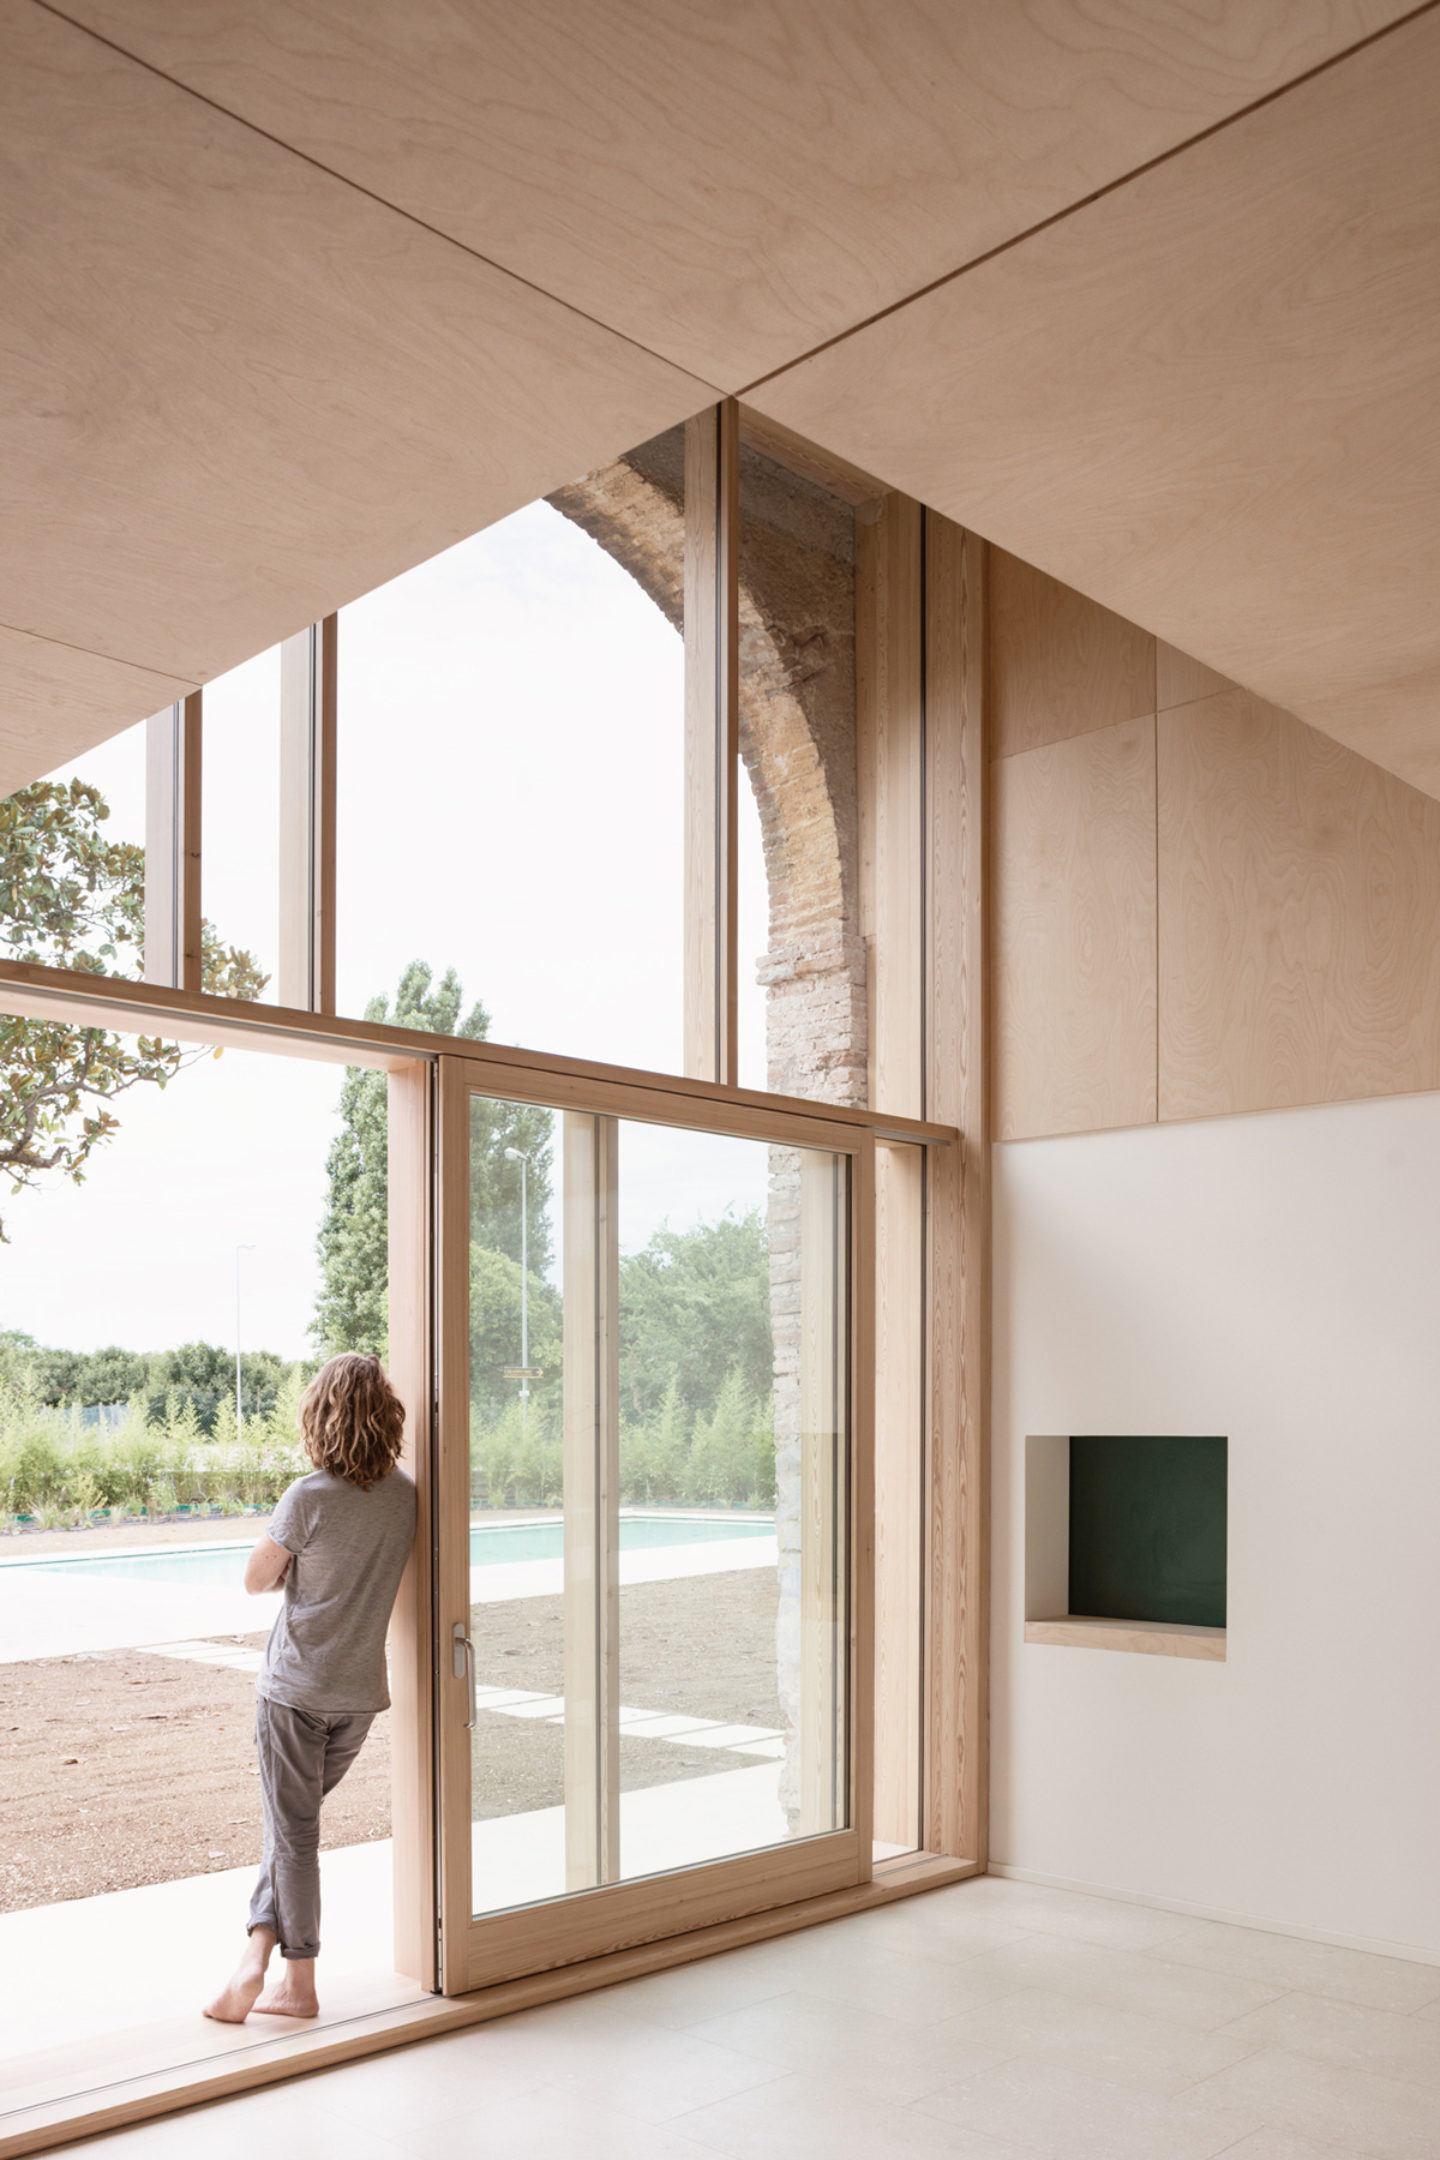 IGNANT-Architecture-Studio-Wok-Country-Home-In-Chievo-6